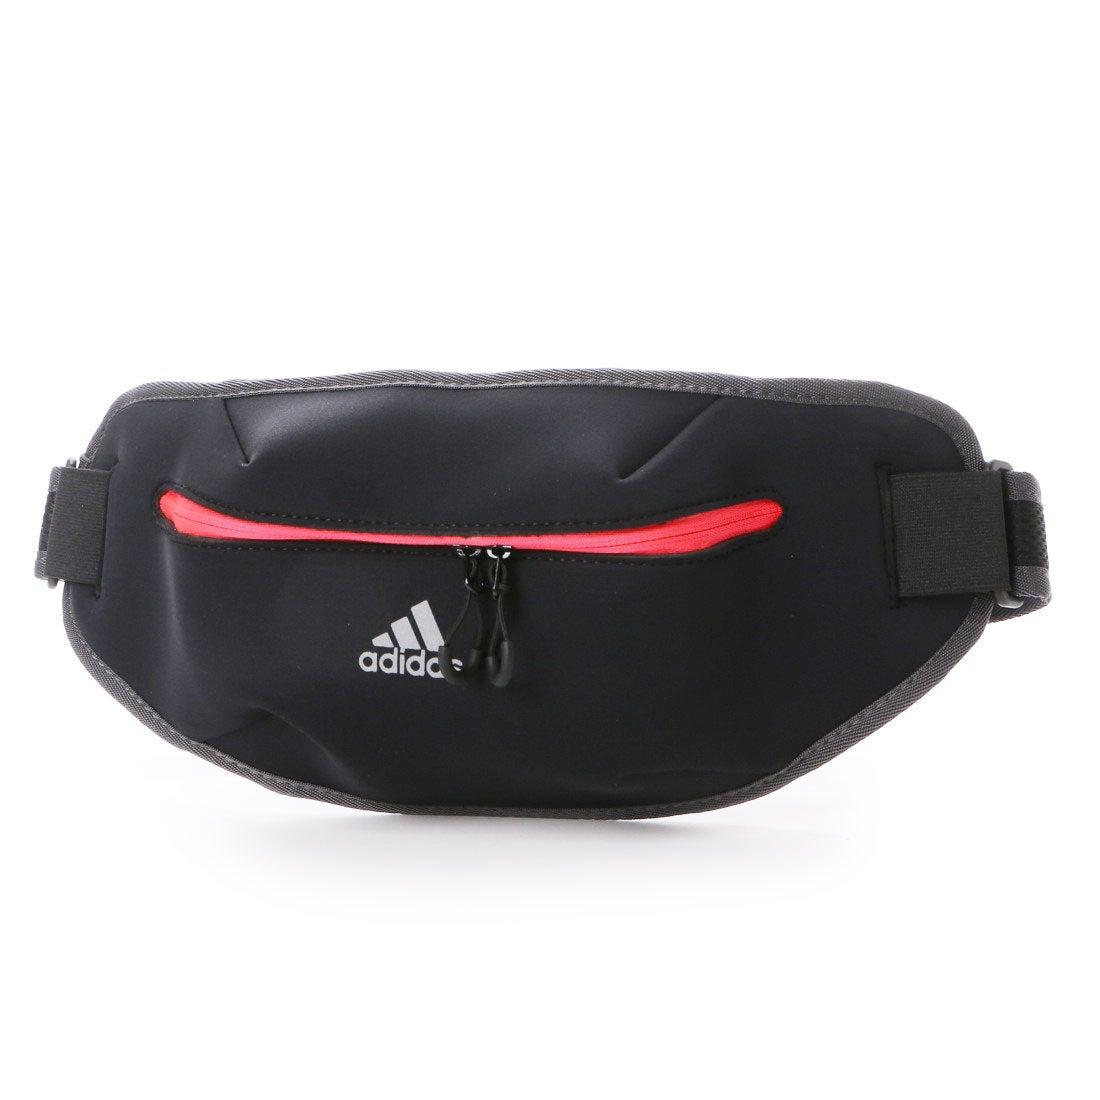 【SALE 7%OFF】アディダス adidas ユニセックス 陸上/ランニング ウエストバッグ ランニング ウエストポーチ AZ4201 (ブラック)